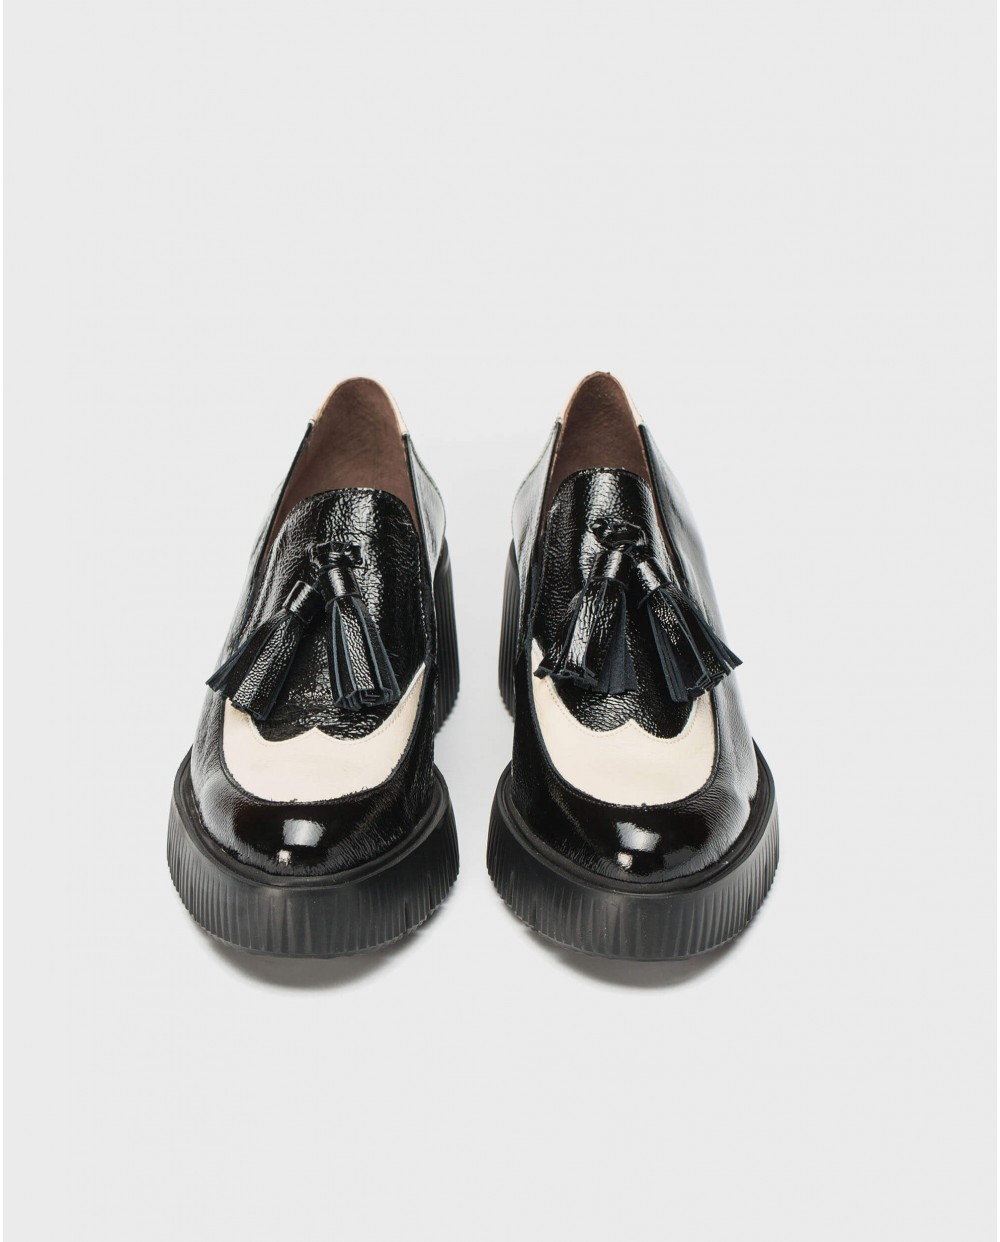 Wonders-Flat Shoes-Platform moccasin with tassel